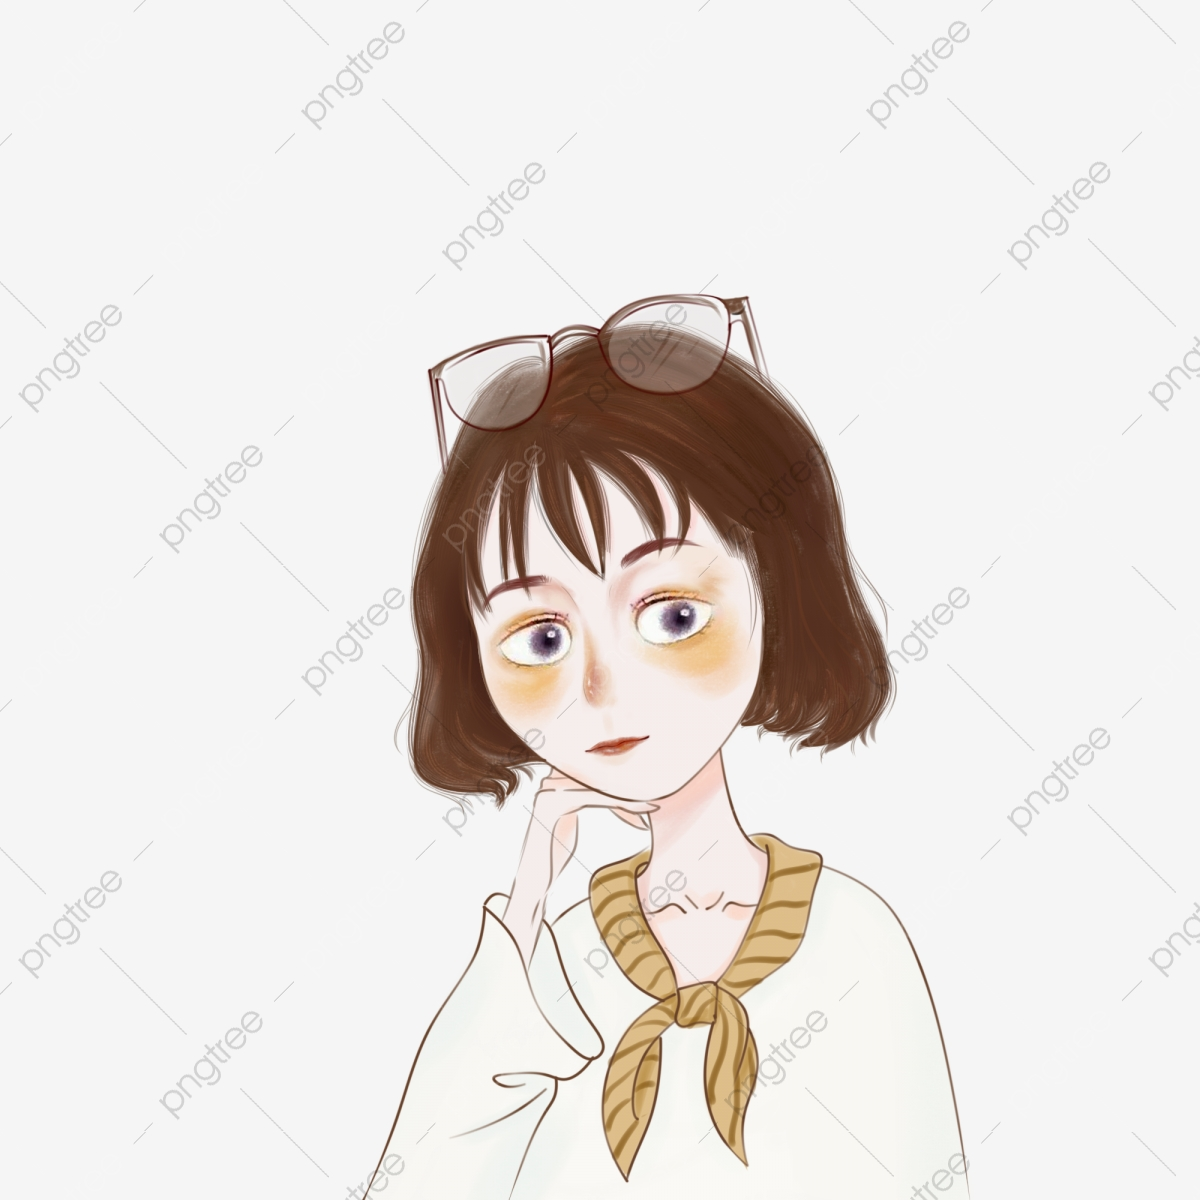 Short Hair Girl Avatar Cute Cartoon Glasses Hand Drawn Short Hair